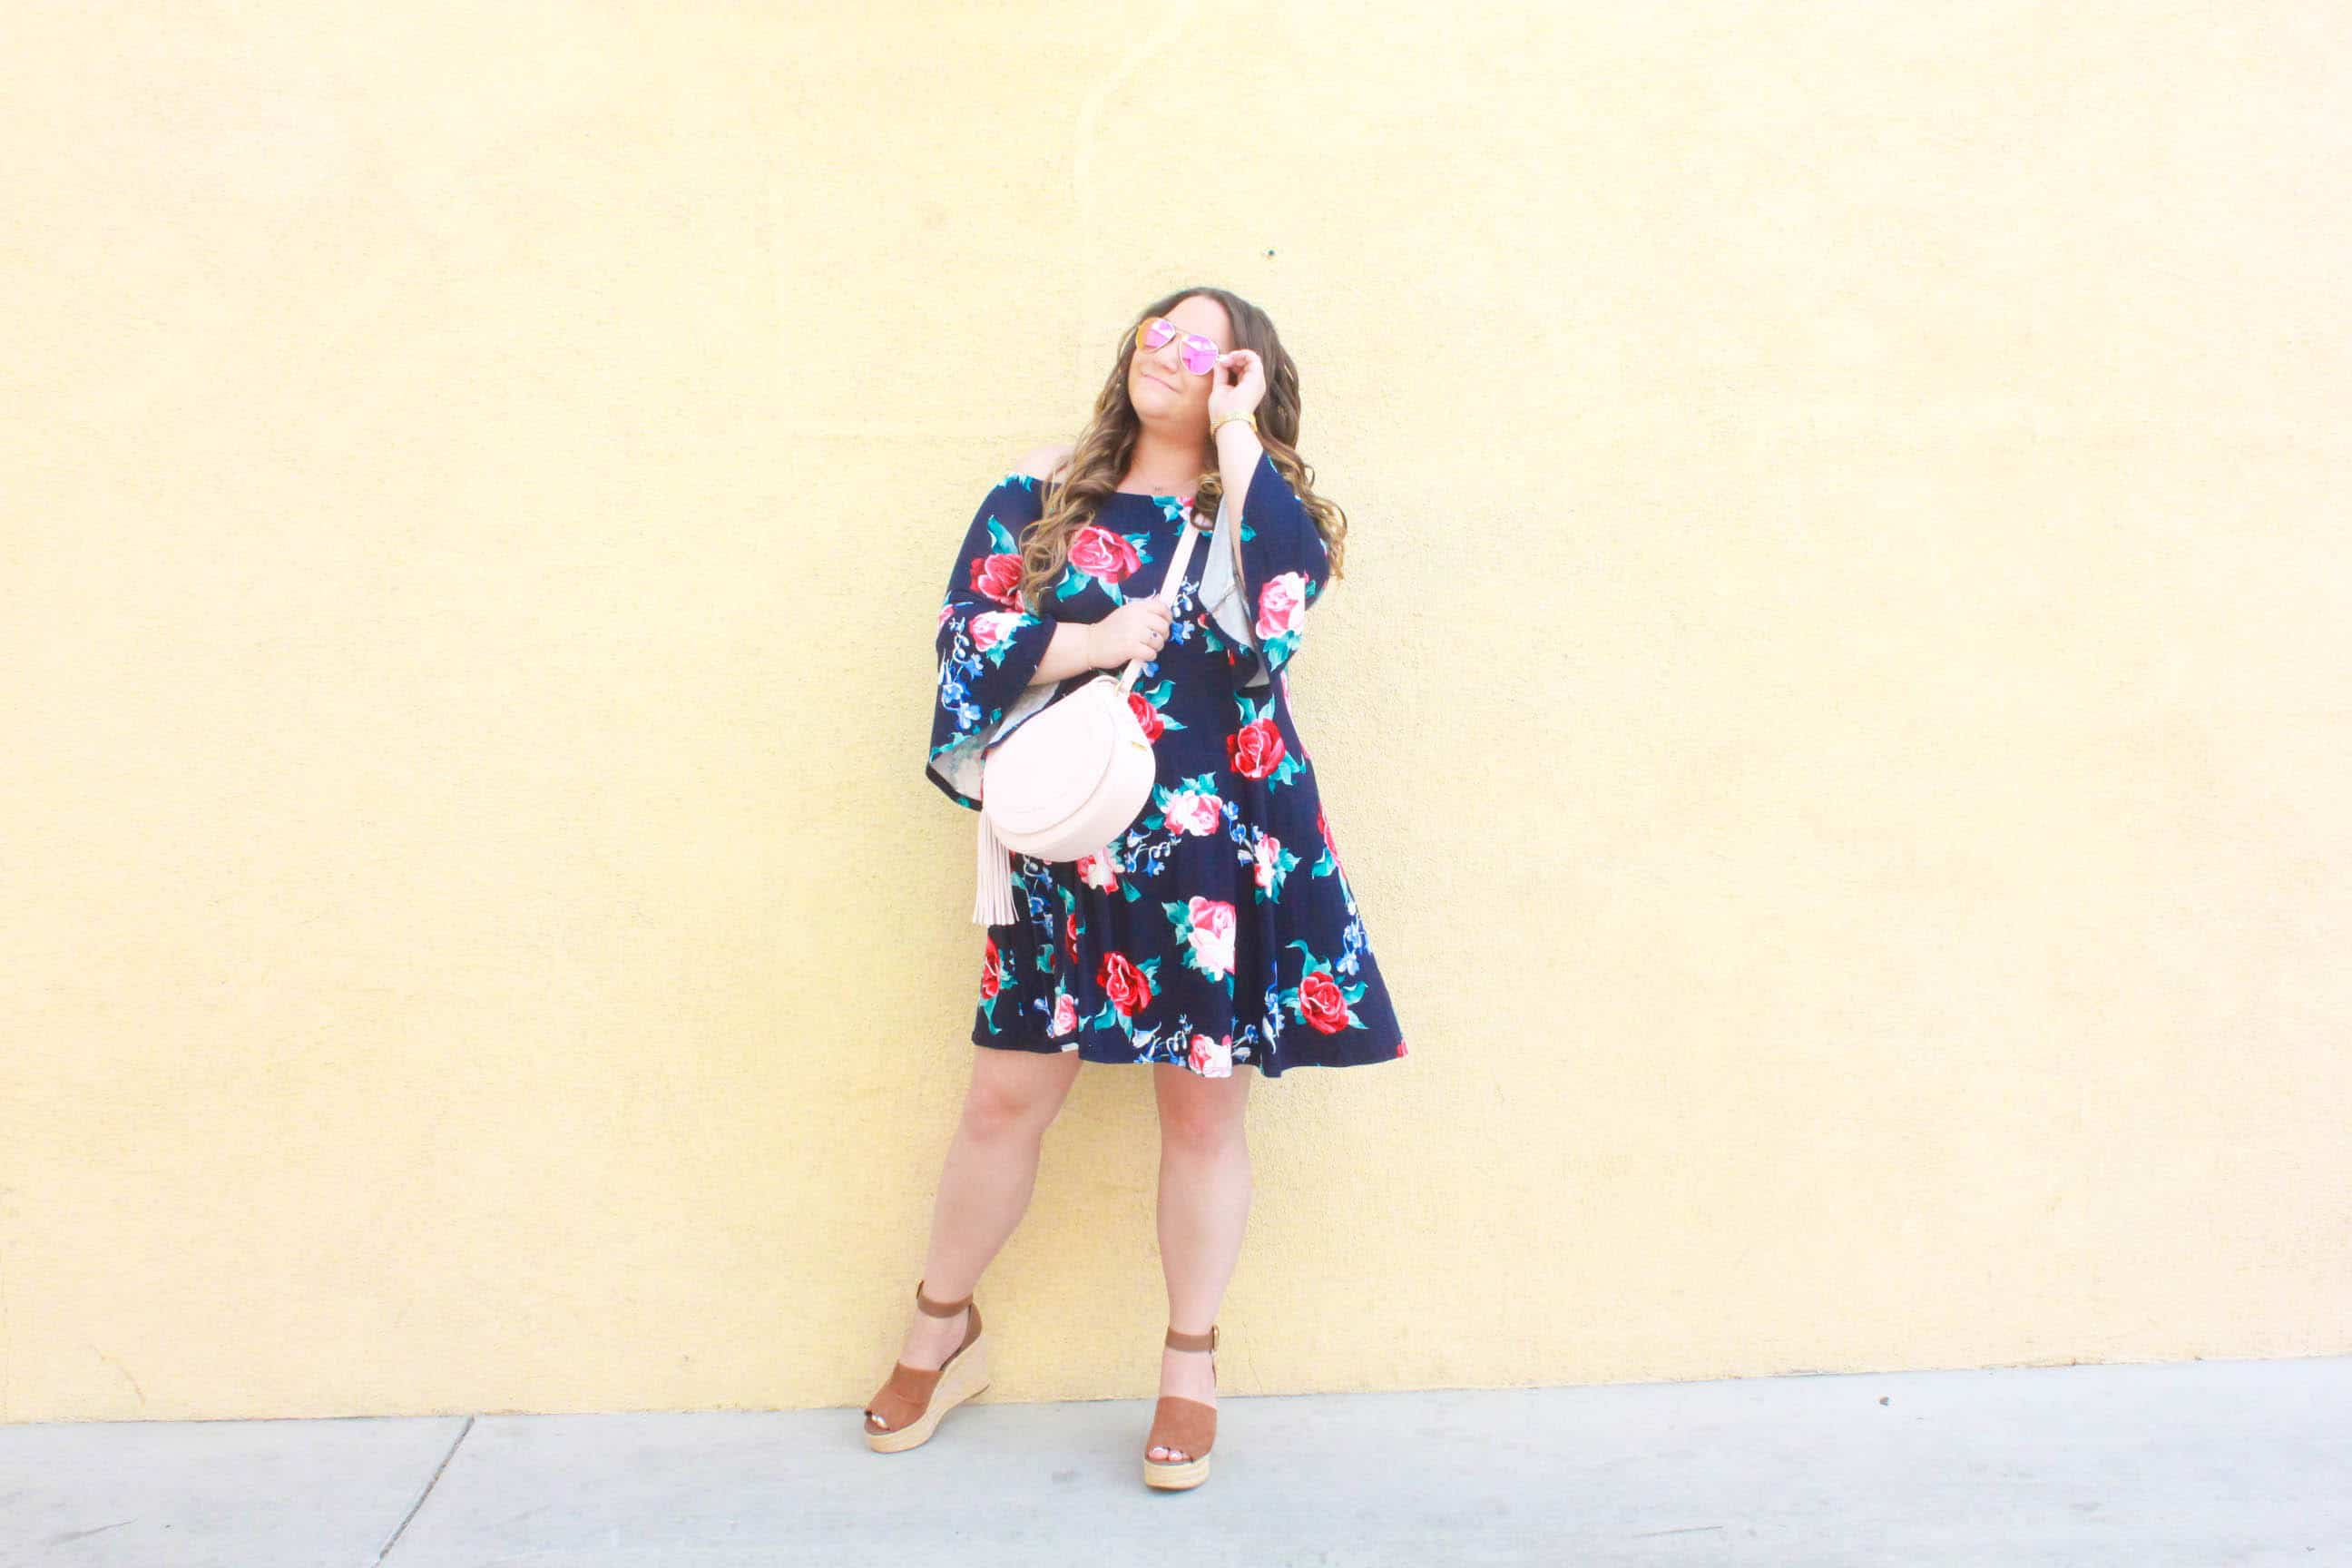 missyonmadison, missyonmadison blog, missyonmadison instagram, melissa tierney, fashion blog, fashion blogger, style blog, style blogger, street style, spring style, spring style inspo, stay warm in style, stay warm in style dress, tan platform espadrille wedges, tan espadrille wedges, gigi new york, gigi ny, gigi new york crossbody bag, gigi new york pink crossbody bag, bloglovin, floral off the shoulder dress, outfit inspo, fashion outfit inspo,